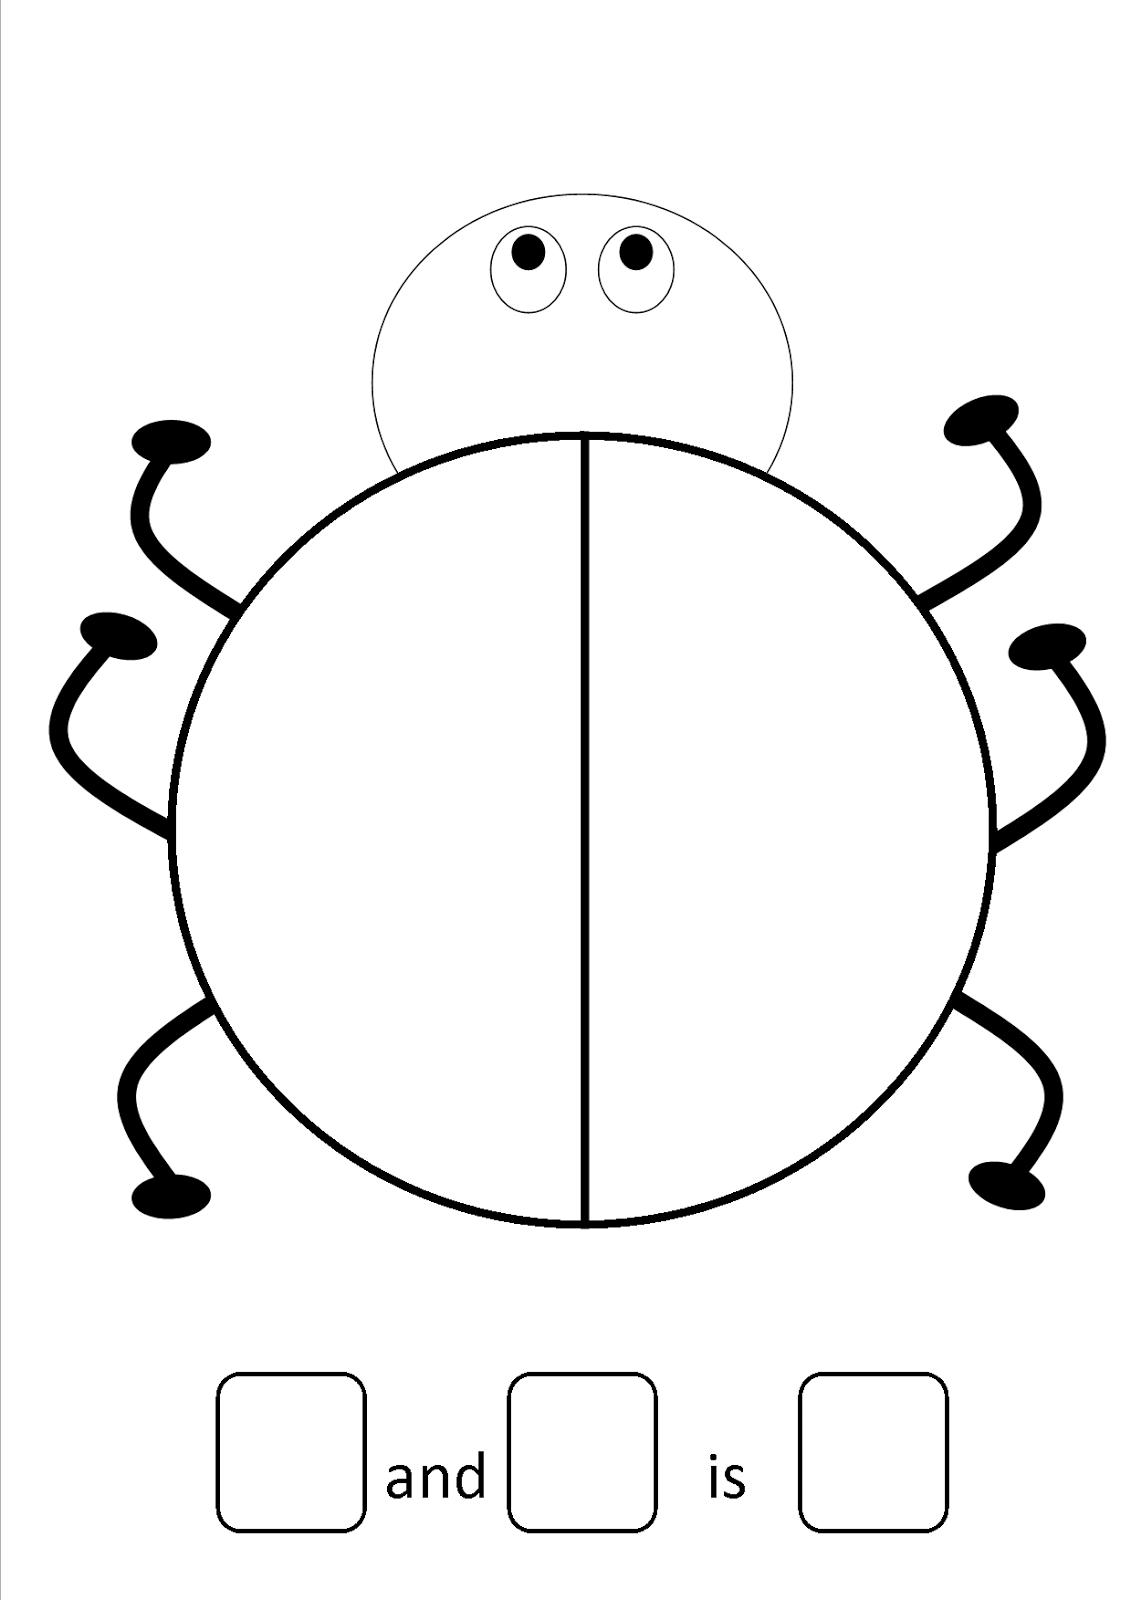 27 Images Of Large Ladybug Template Free | Zeept Inside Blank Ladybug Template